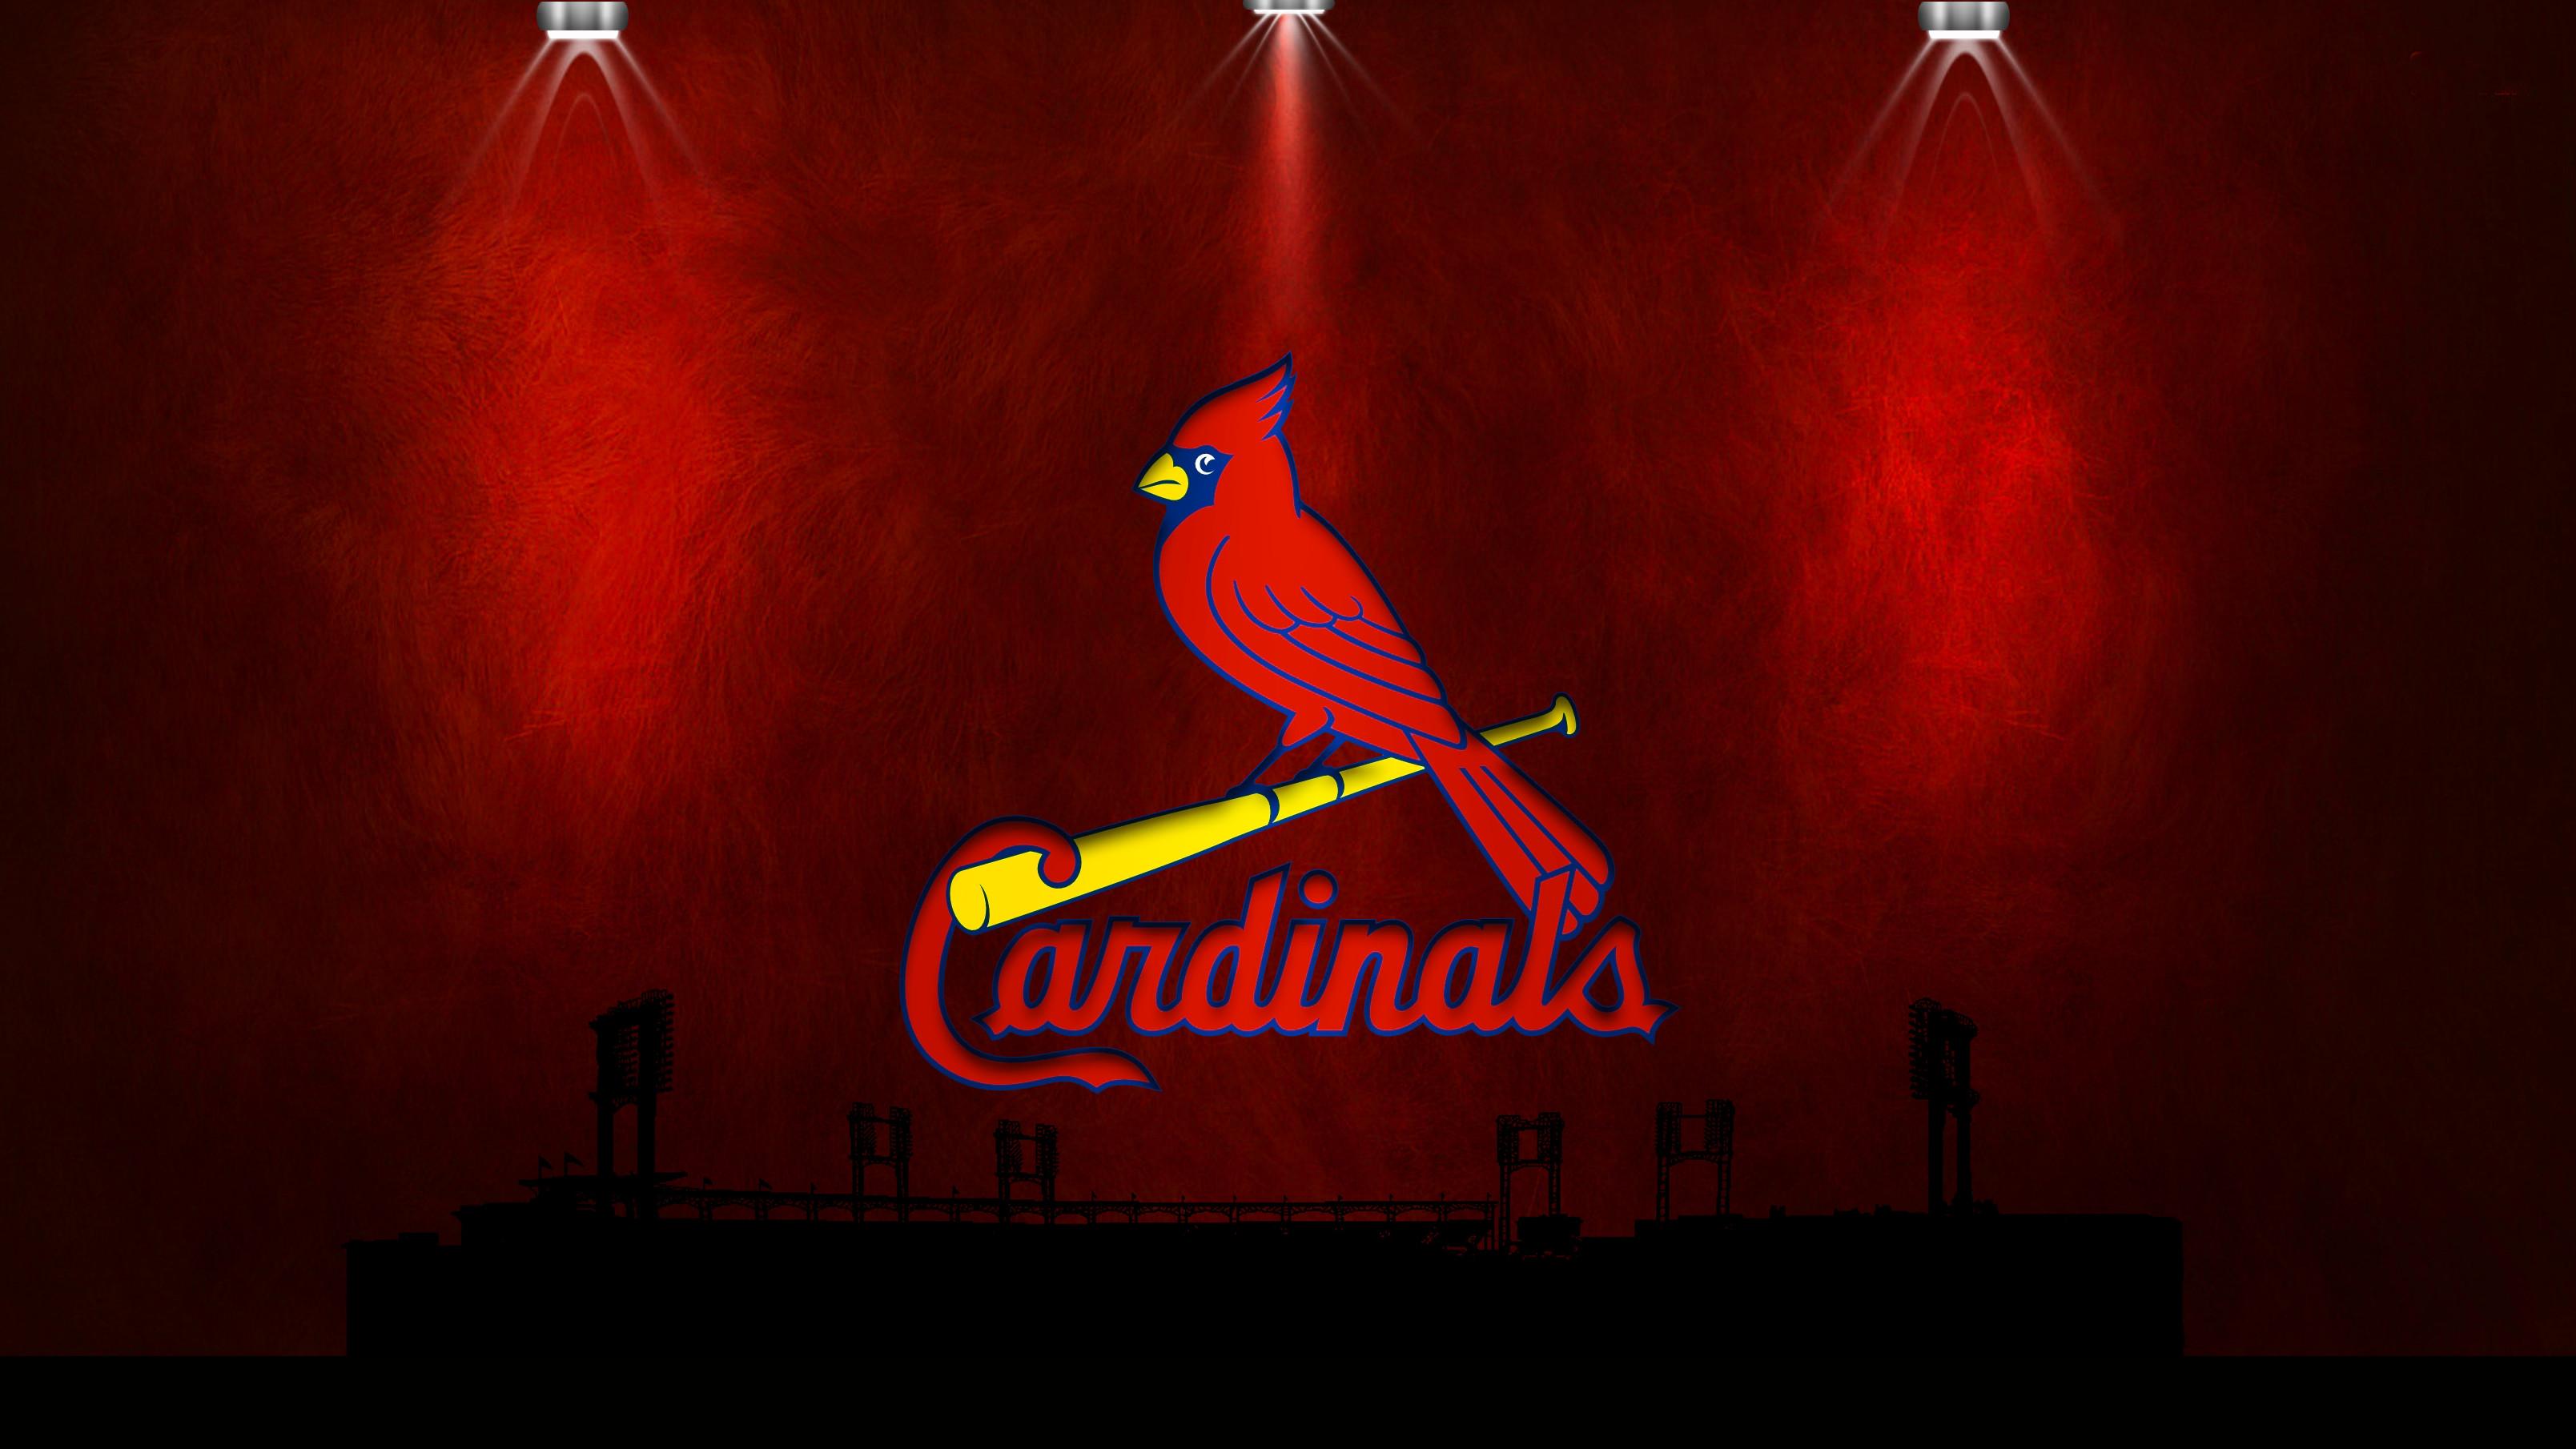 baseball st louis cardinals major league baseball wallpaper hd